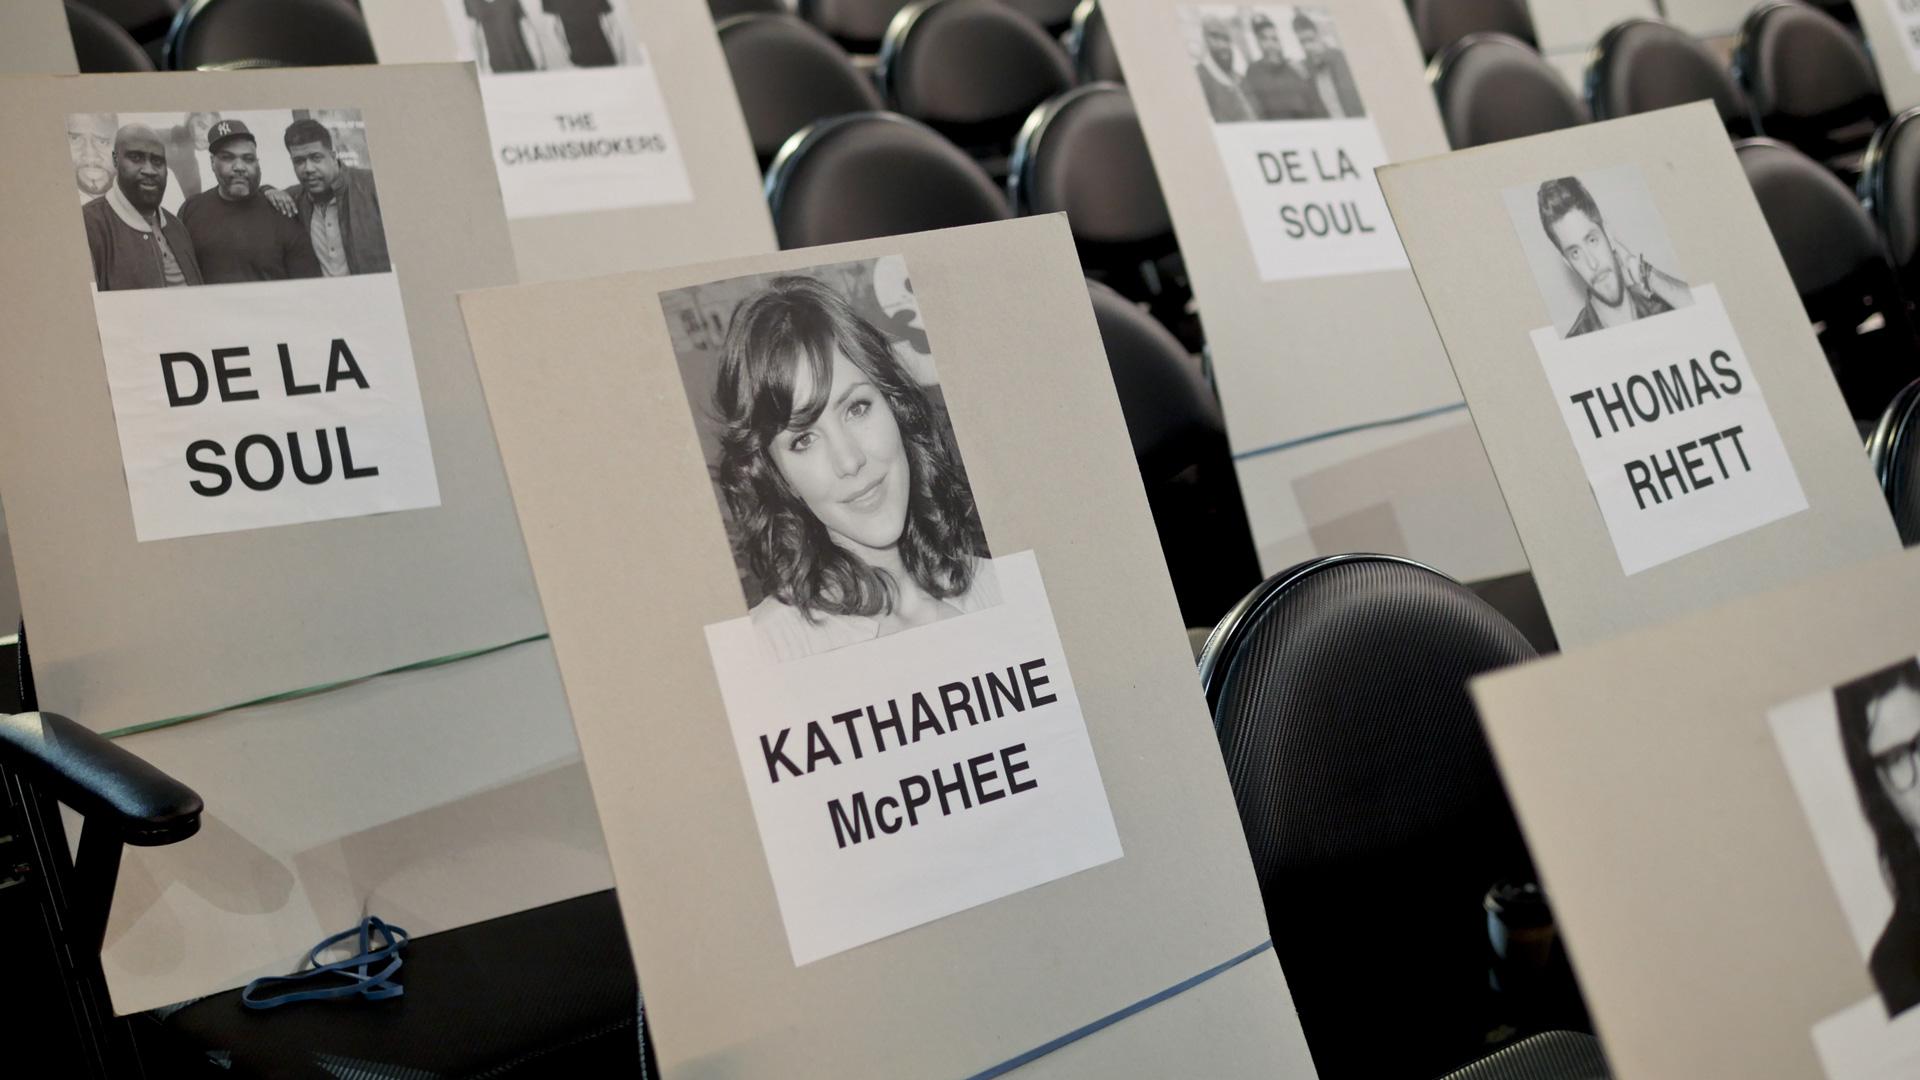 De La Soul, Katharine McPhee, and Thomas Rhett will be GRAMMY neighbors.